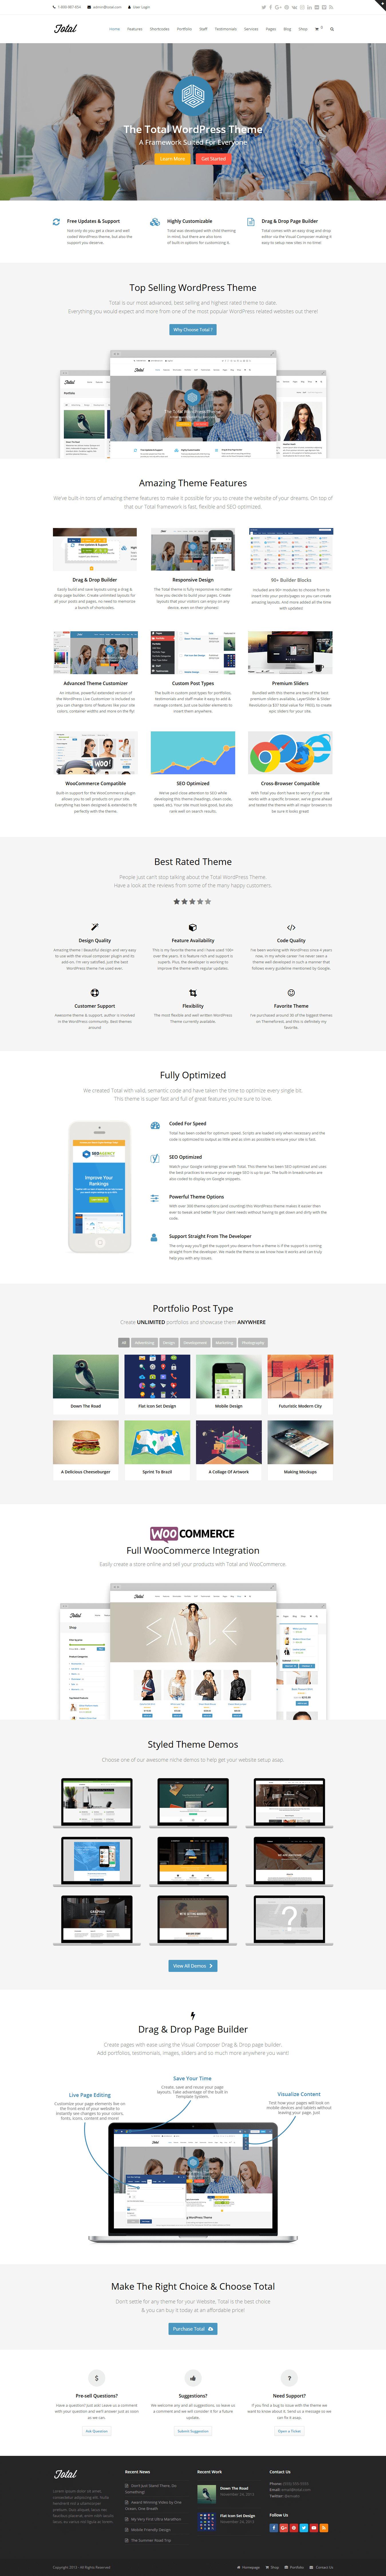 Total - Mejor tema premium multipropósito de WordPress